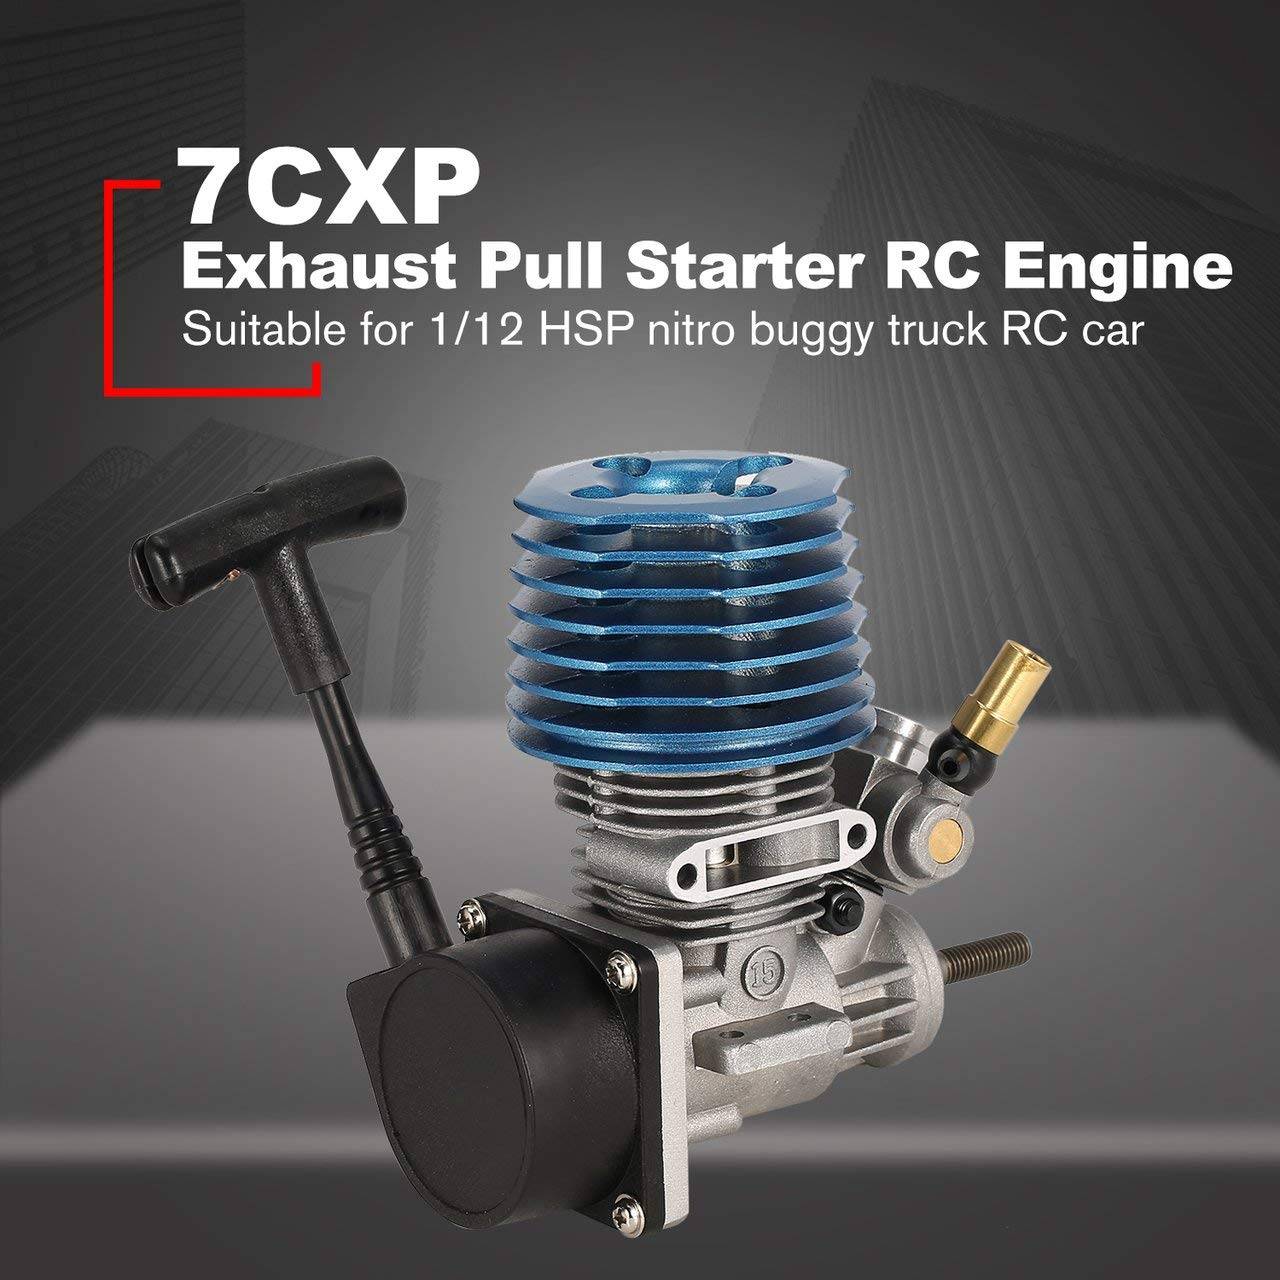 Jasnyfall 1.14CC Seitenabgasmotor Handzug Starter für 1/12 Racing RC Car - Blau